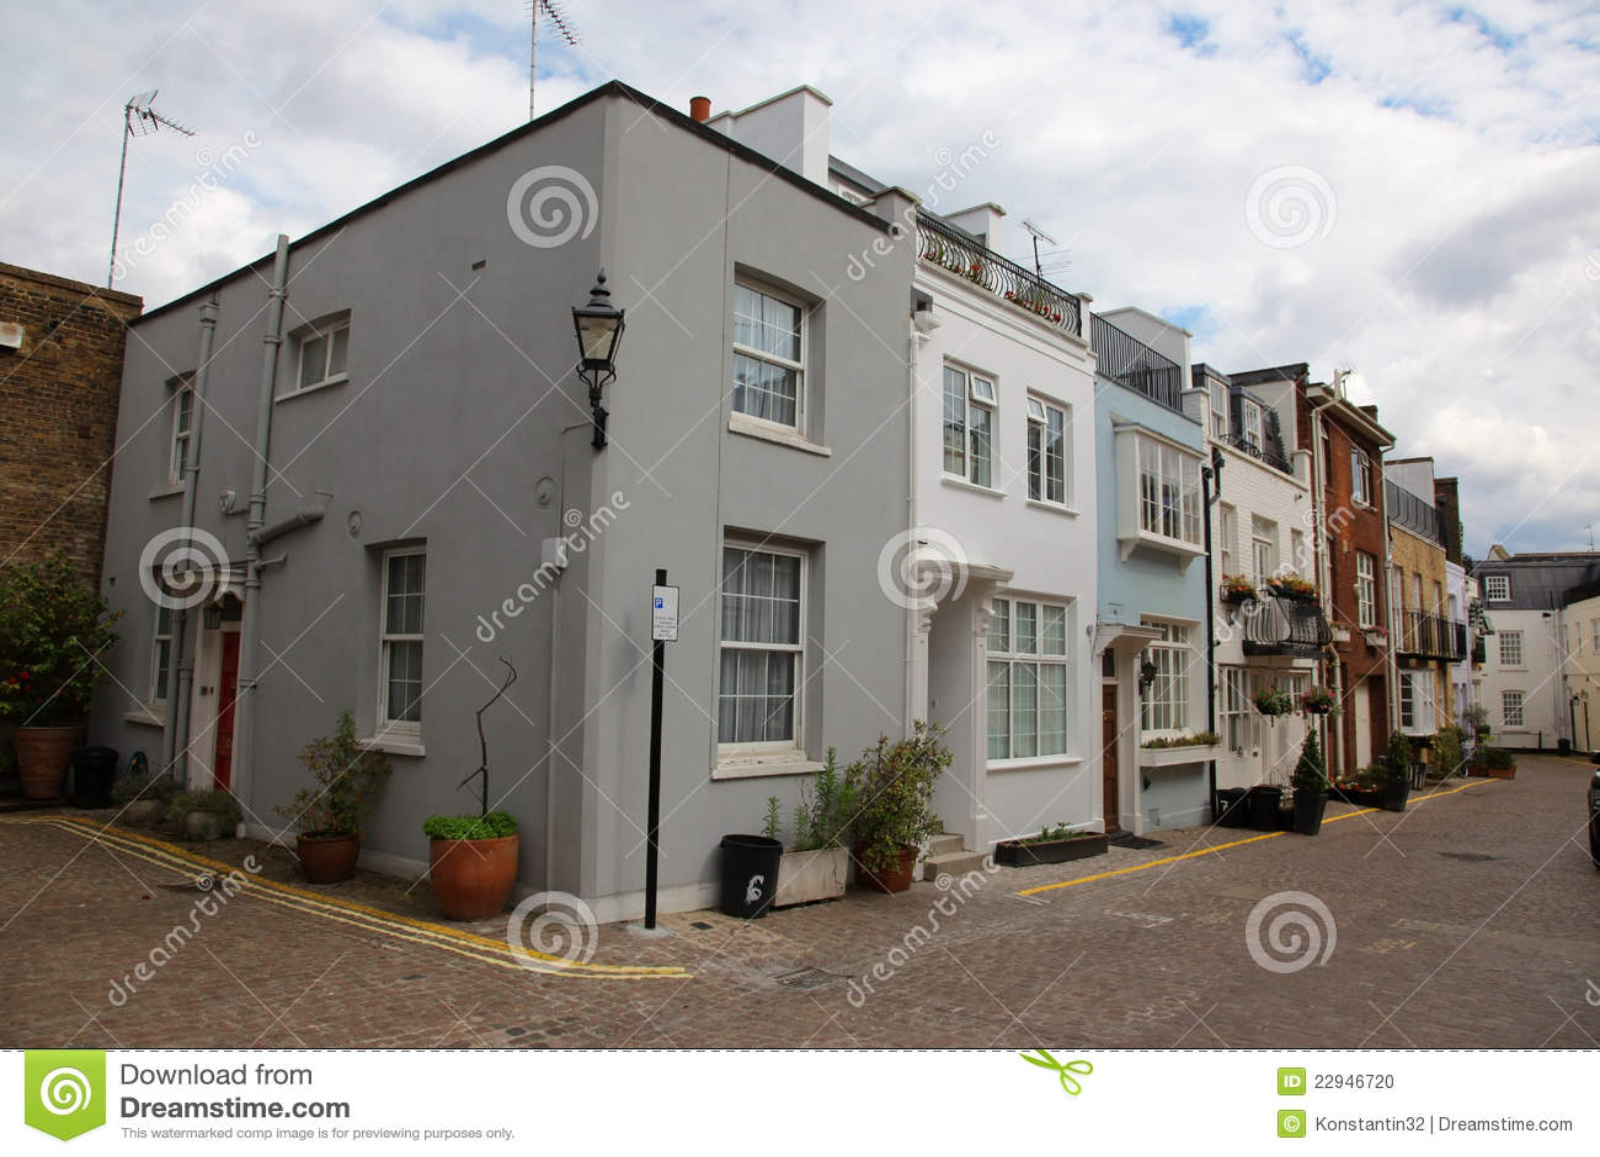 Casas inglesas t picas - Imagenes de casas inglesas ...